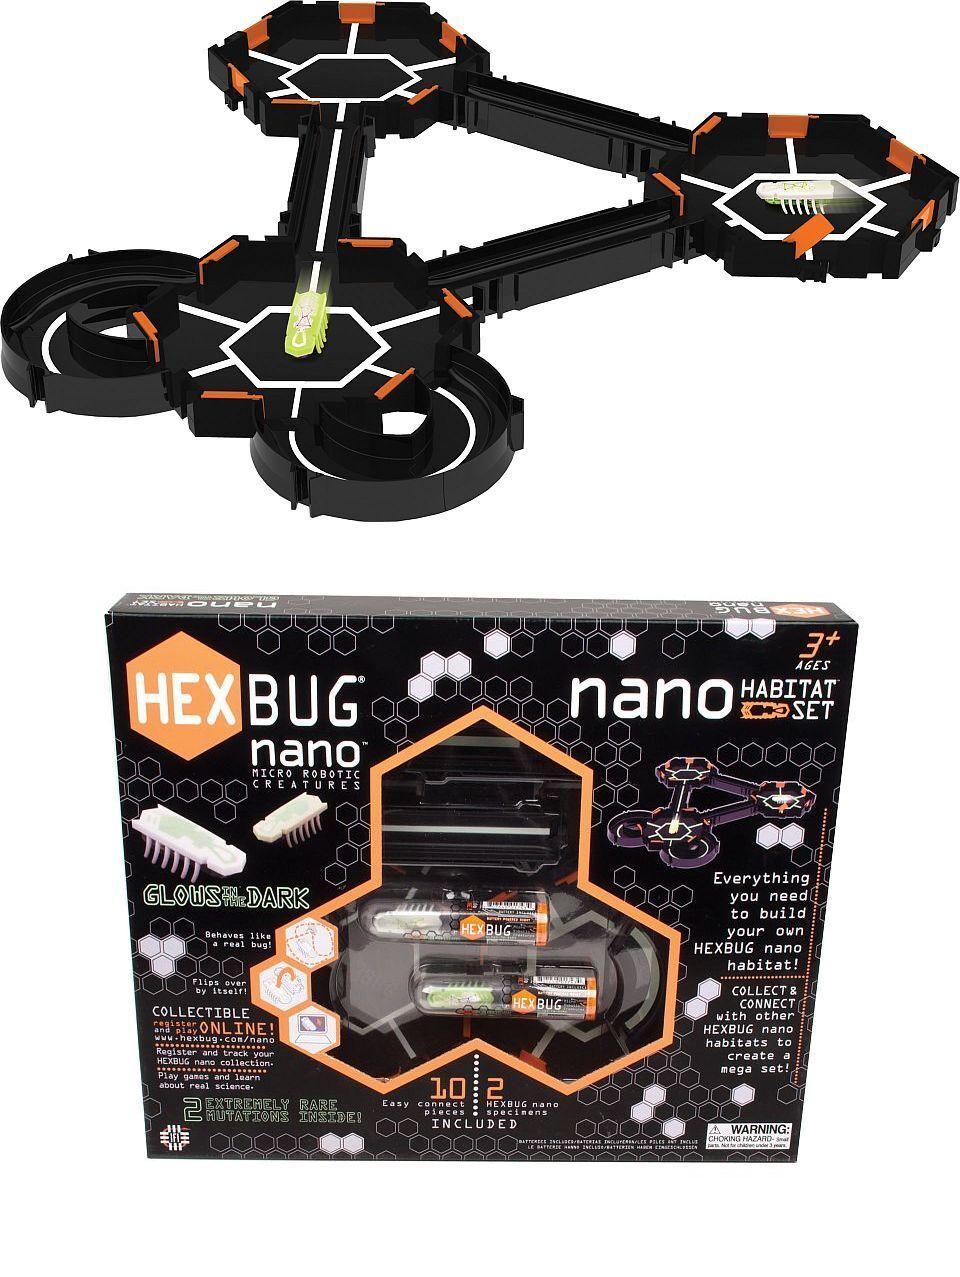 Hexbug Robot Habitat Pista Gioco Set Nottilucenti Nano Spielzeugroboter Gioco